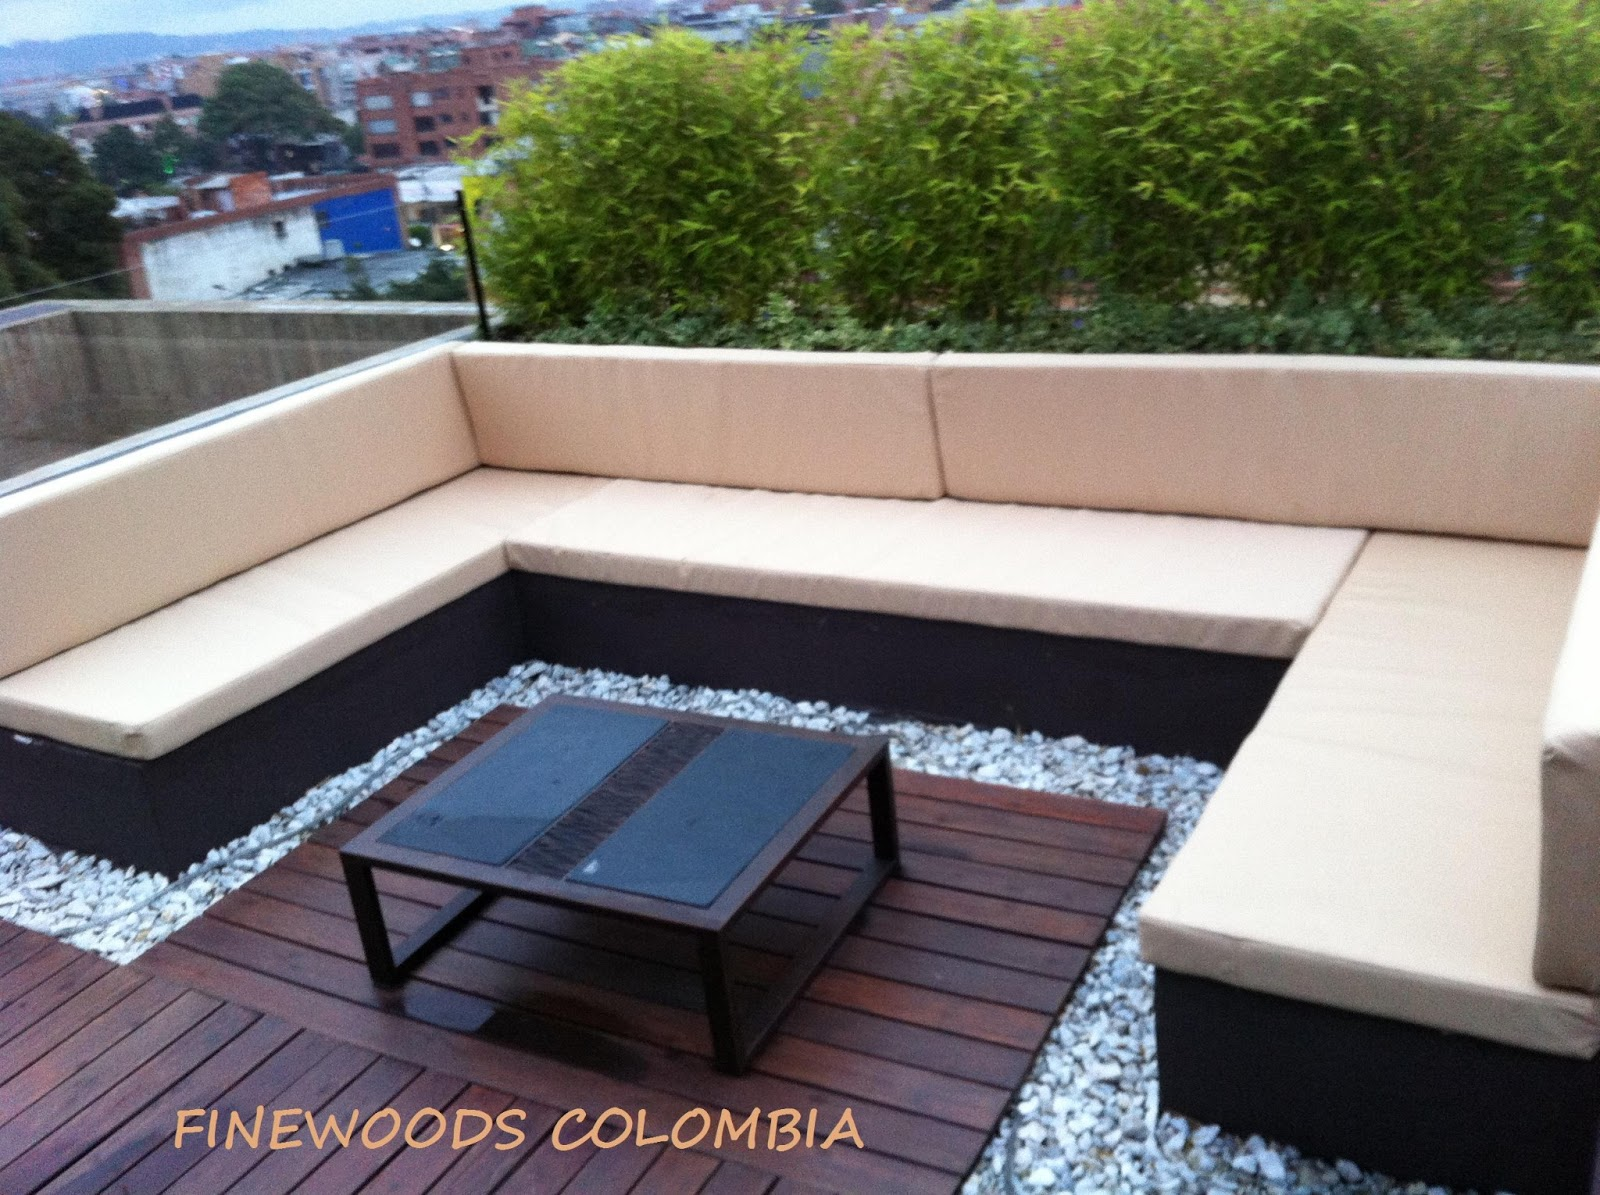 Finewoods colombia muebles exterior - Cojines muebles exterior ...